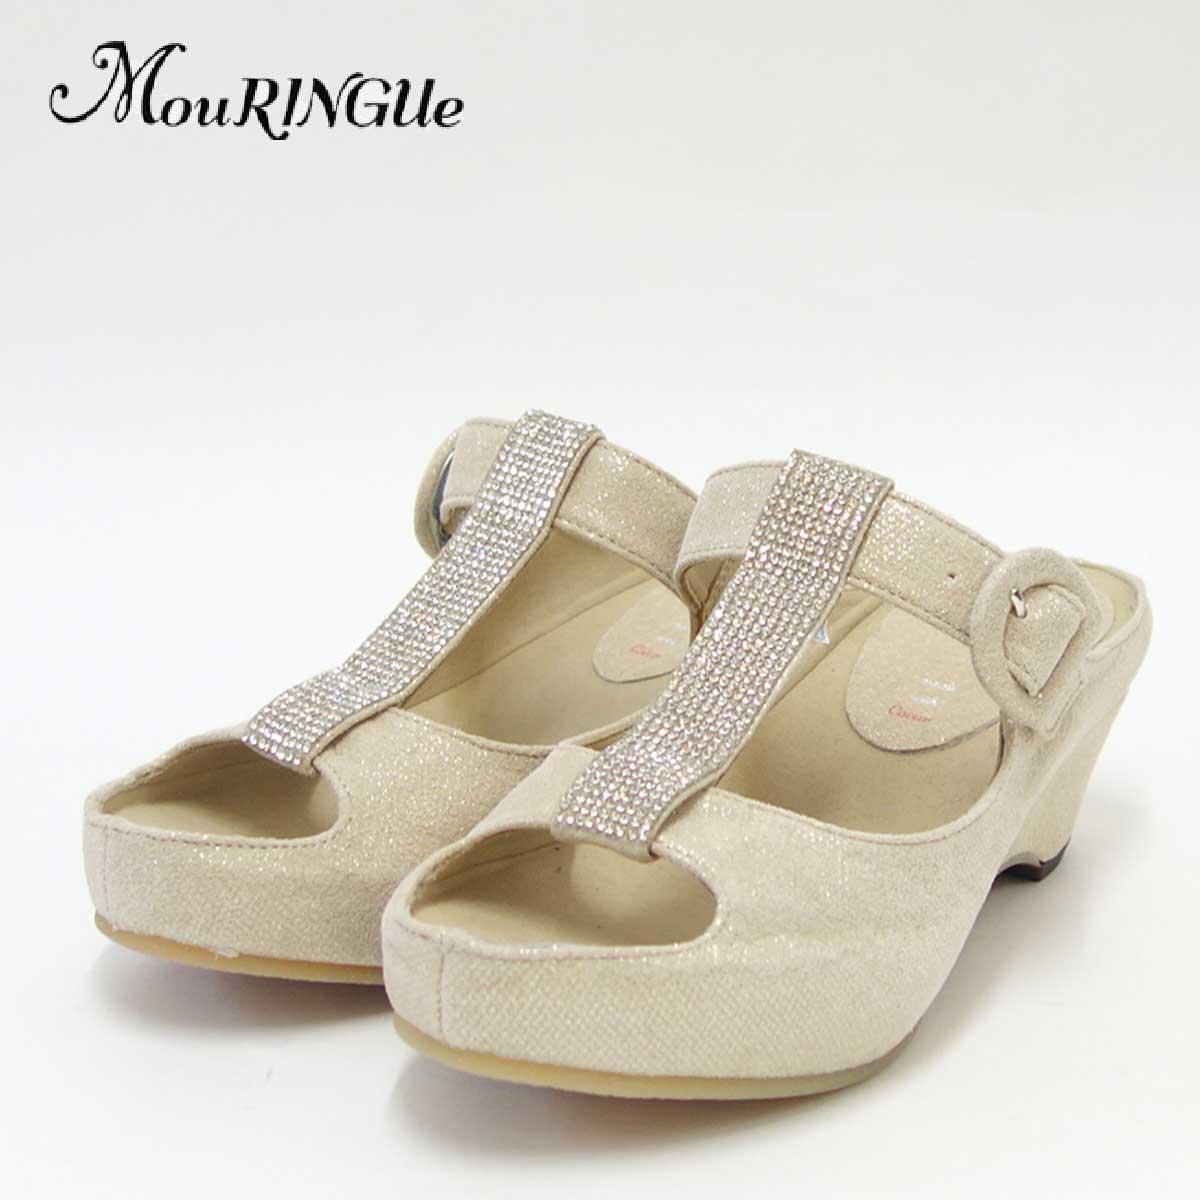 『MouRINGUe ムラング』Coeur568002 LGO(日本製)快適クッションミュール「靴」